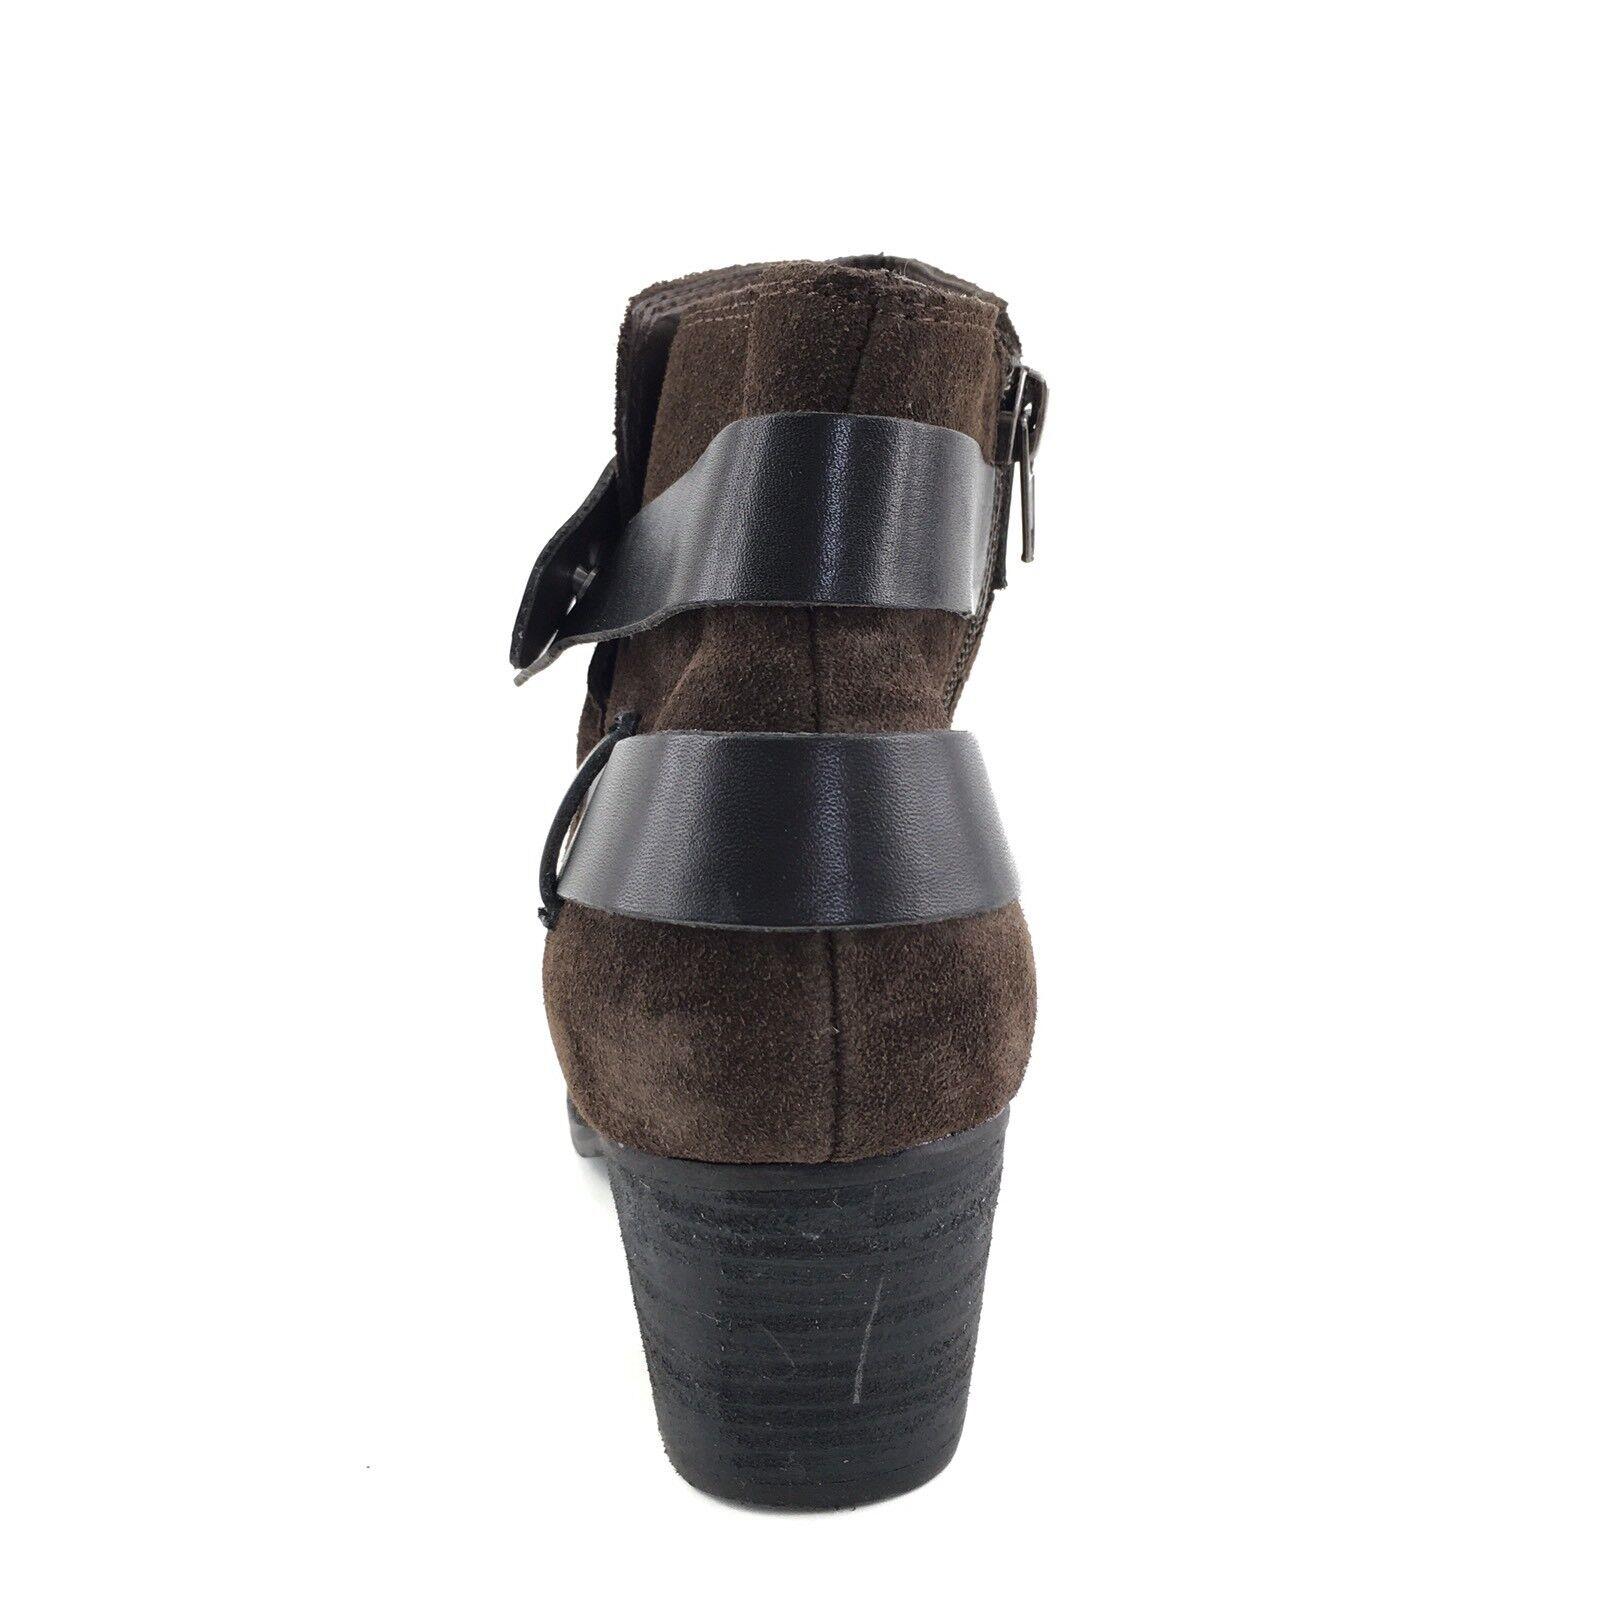 195 Dolce Stivali Vita Java Brown Suede Ankle Stivali Dolce Donna Size 9 M 622b7b